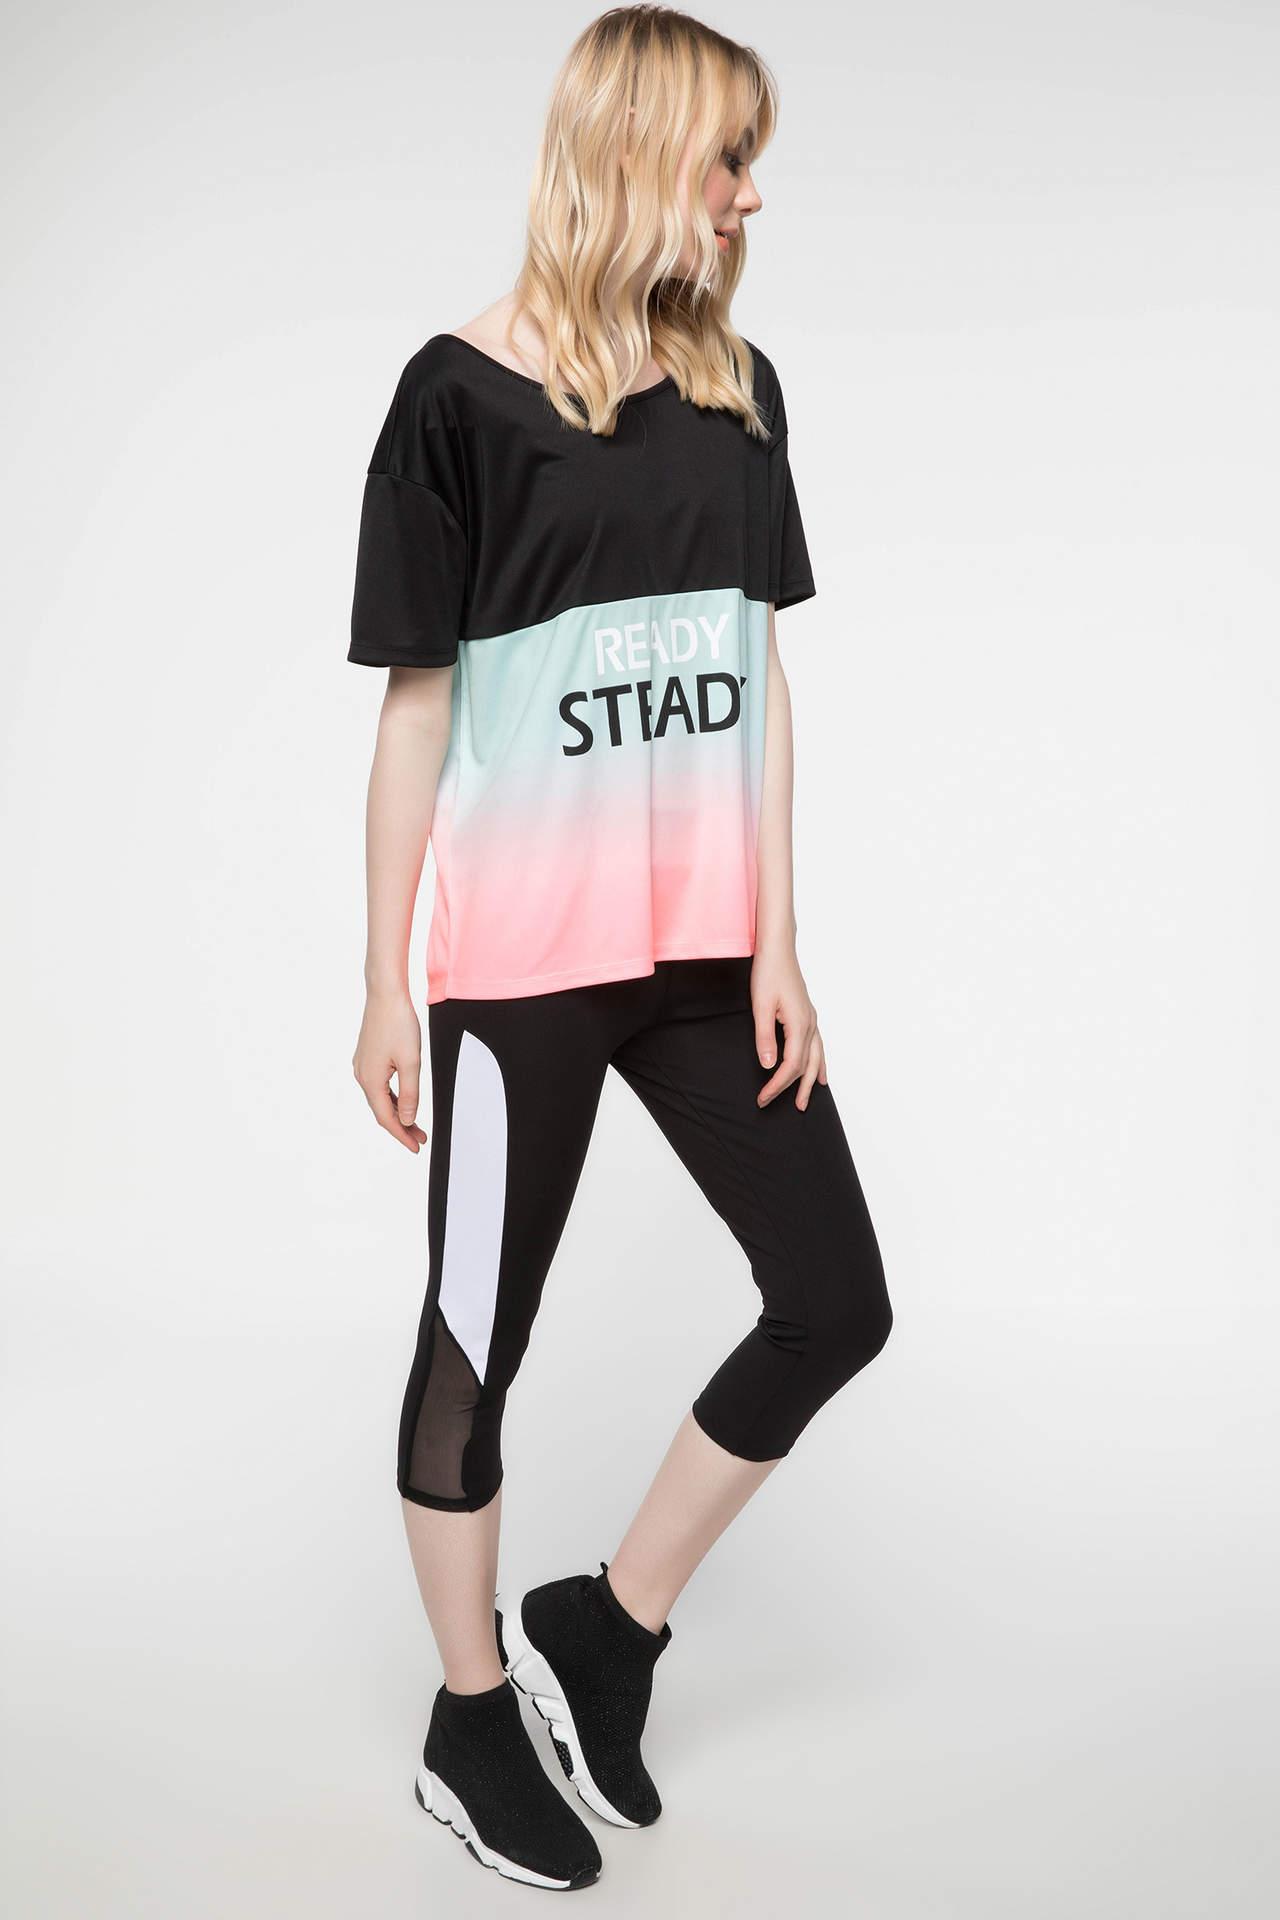 DeFacto Kadın Dekolte Detaylı Slim Fit Sporcu Tayt Siyah female